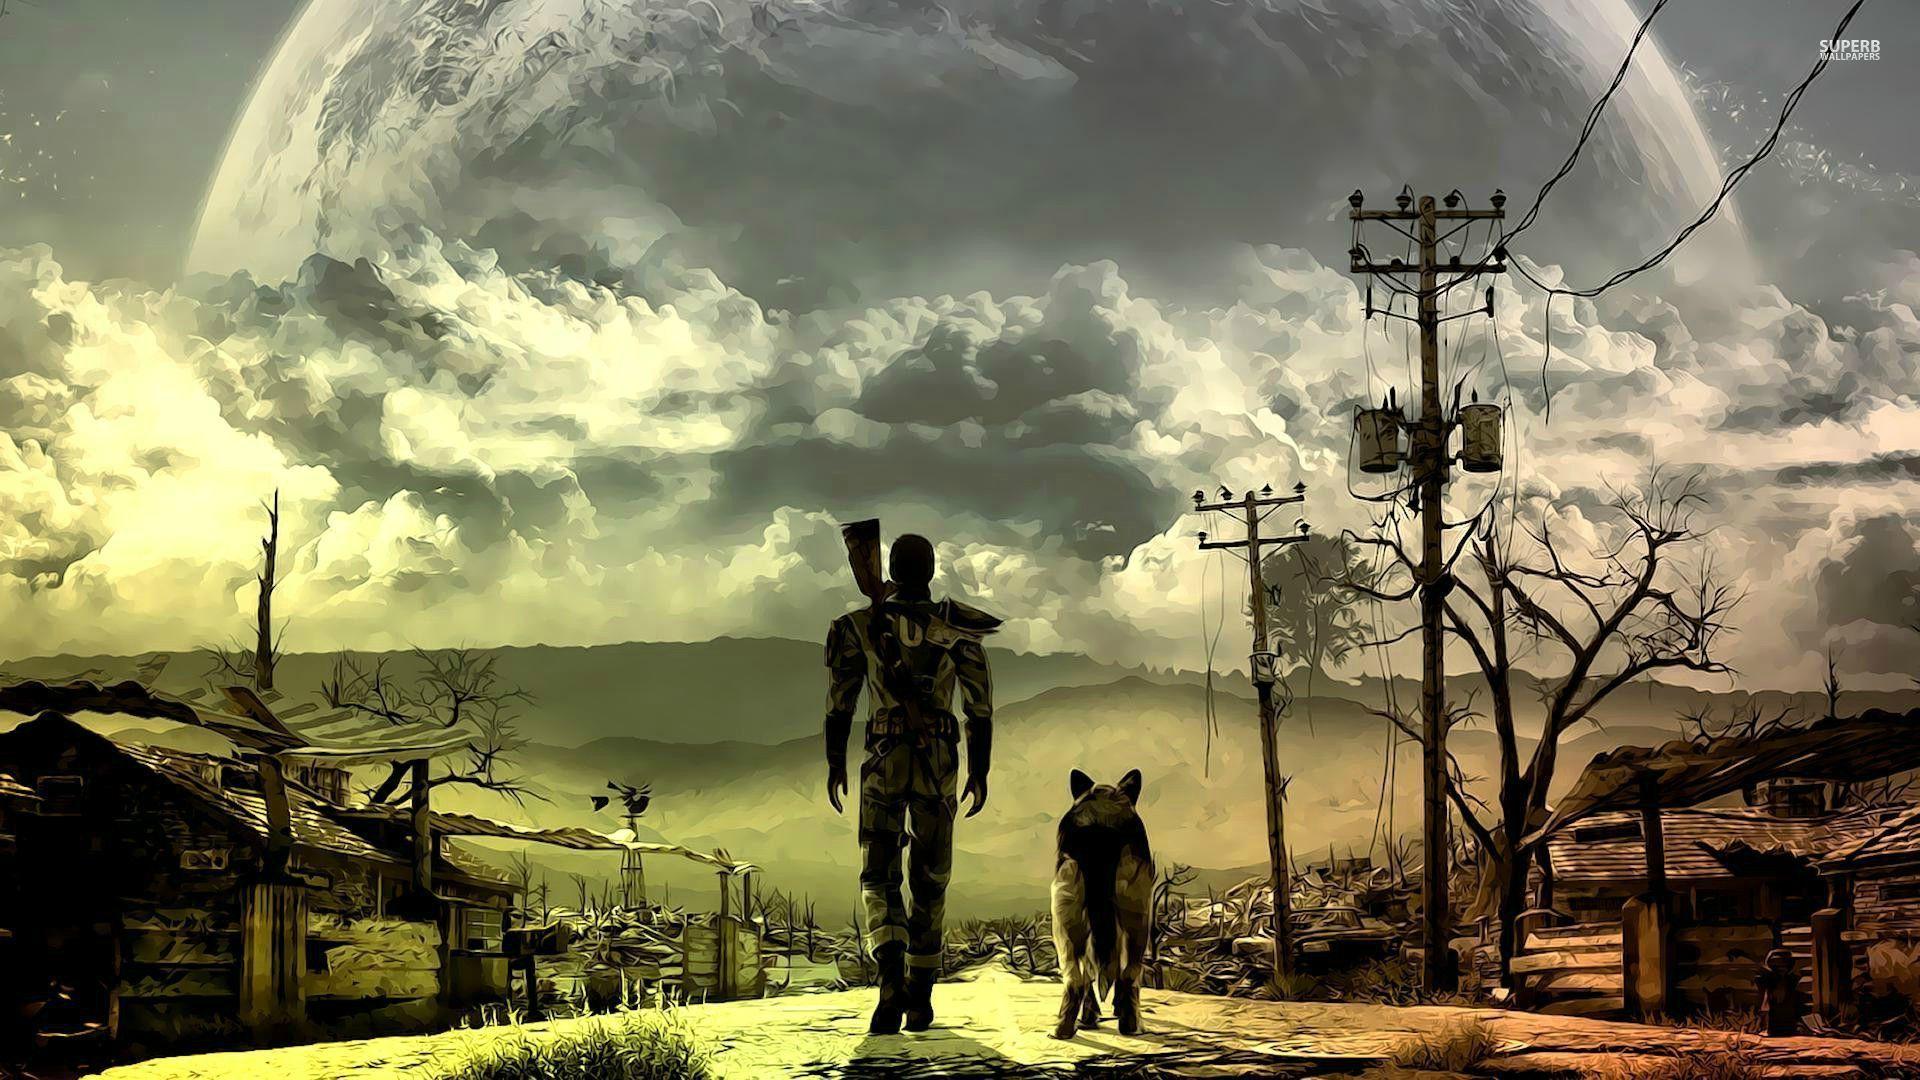 [47+] Cool Fallout 4 Wallpapers on WallpaperSafari